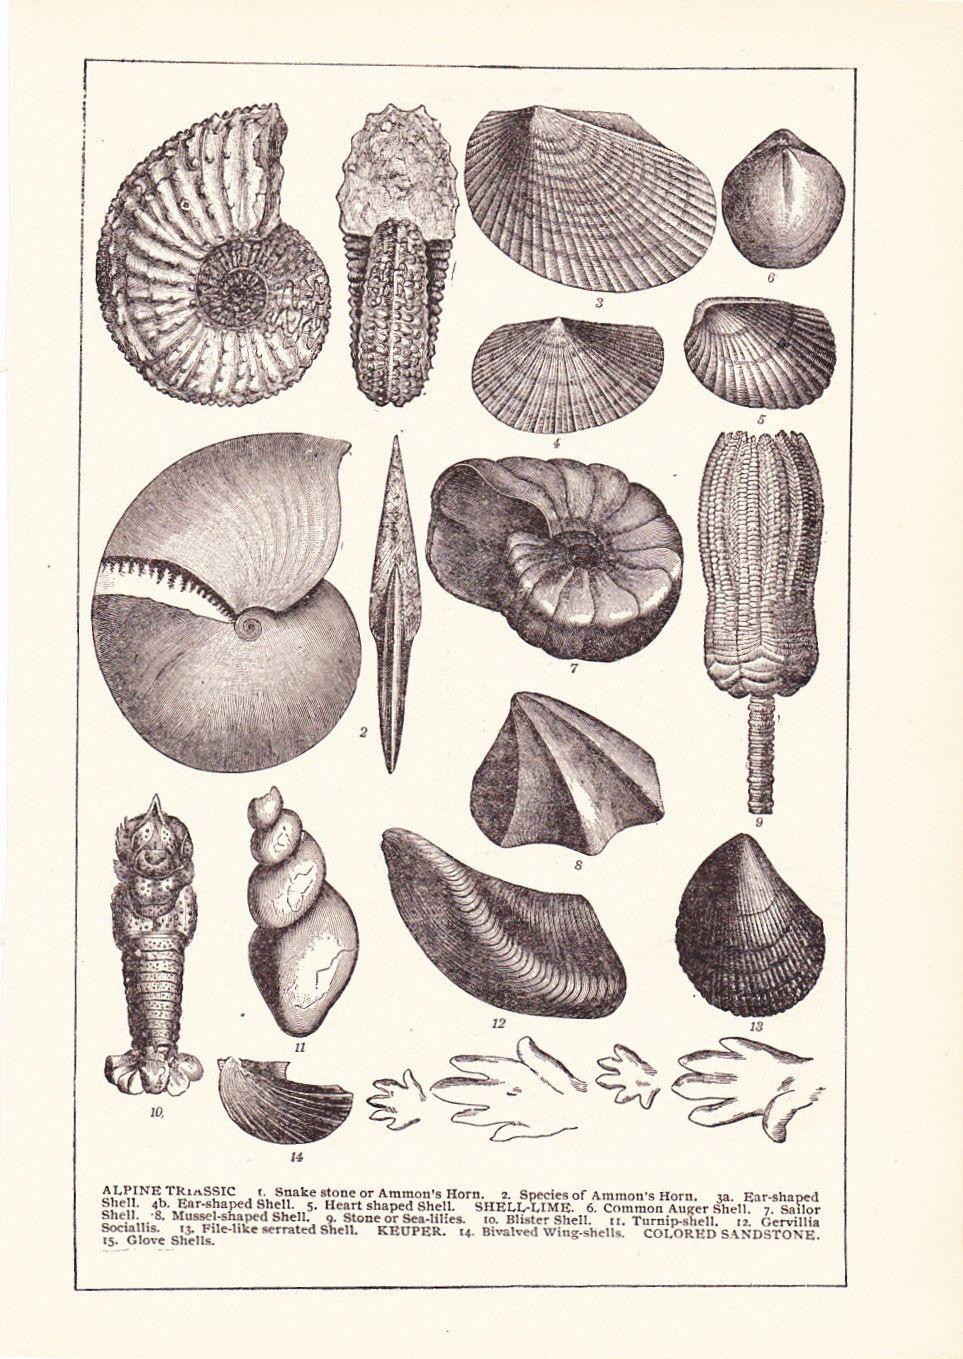 1902 sea shell print vintage antique home decor art illustration